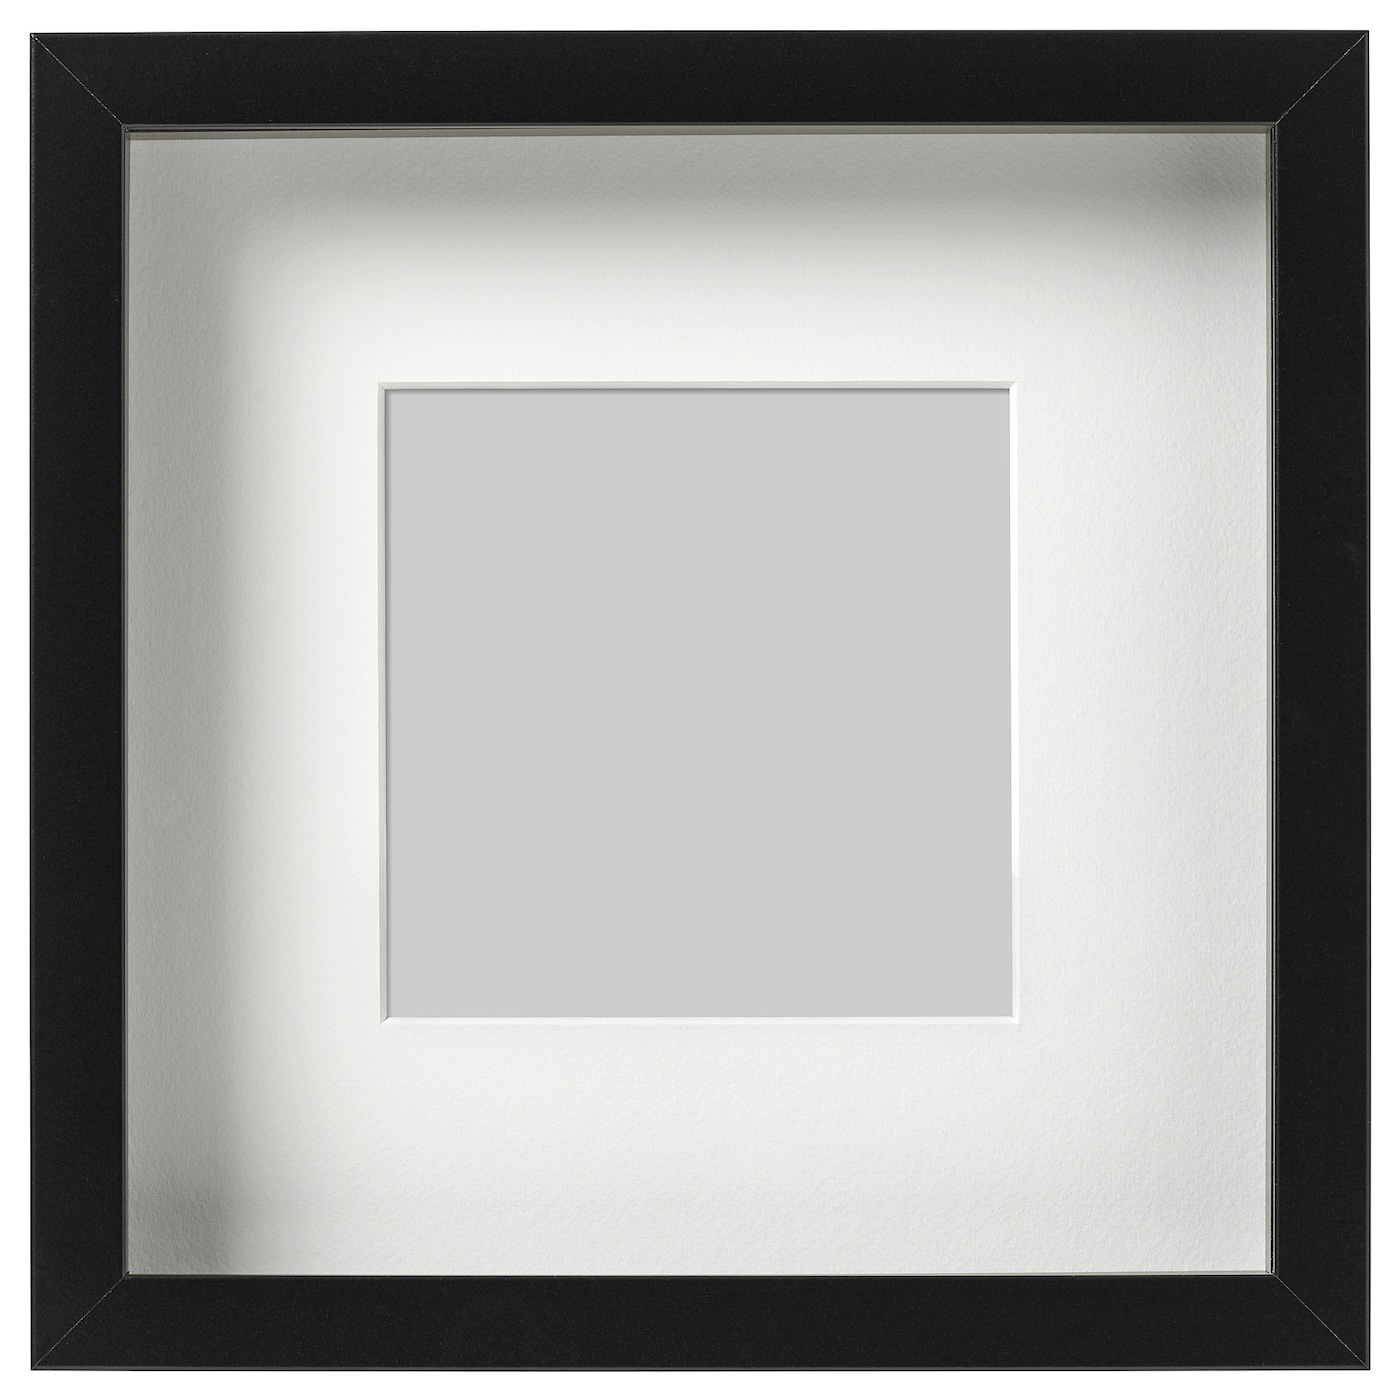 Picture Frames & Photo Frames | IKEA Ireland - Dublin